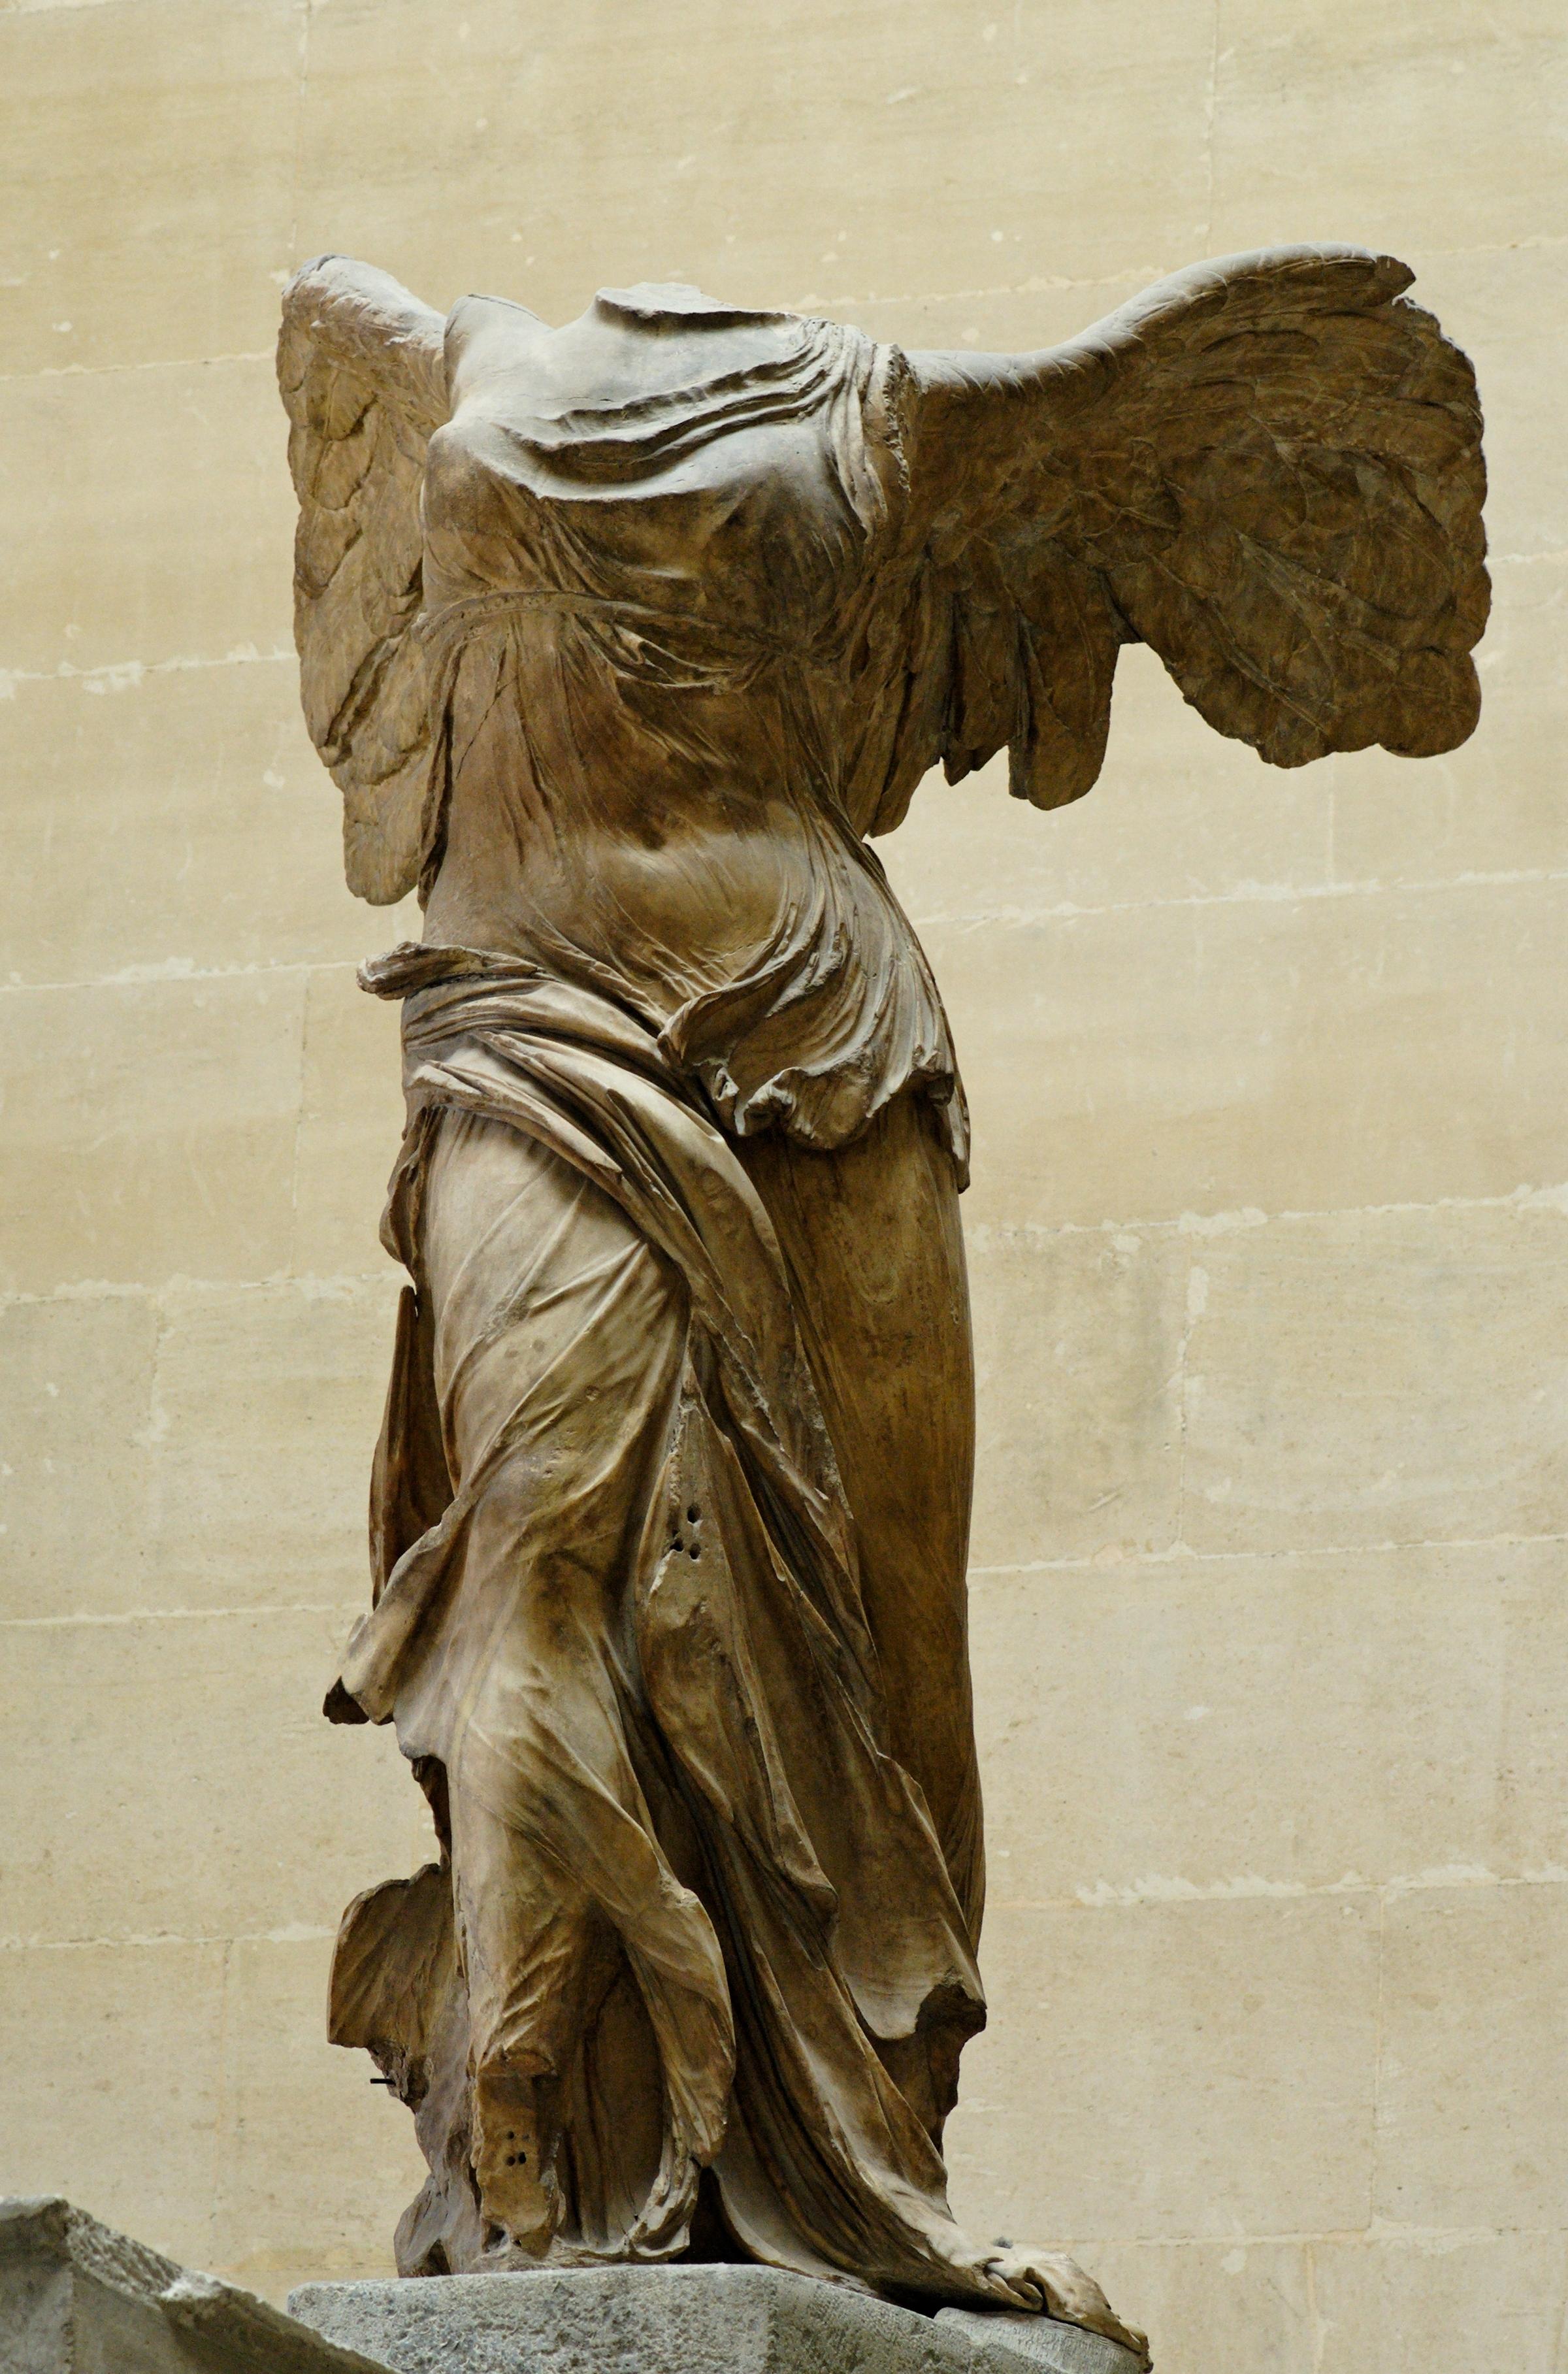 https://i1.wp.com/upload.wikimedia.org/wikipedia/commons/9/92/Nike_of_Samothrake_Louvre_Ma2369.jpg